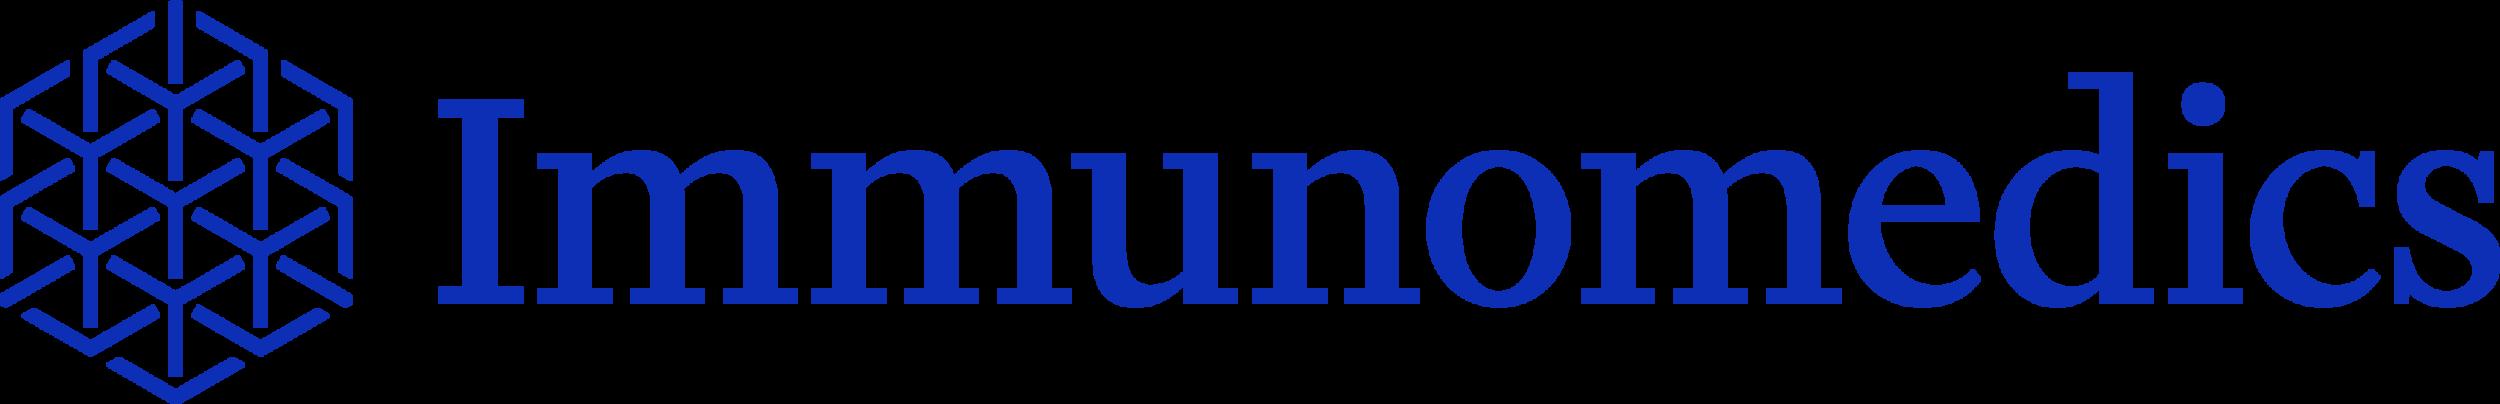 Immunomedics_Logo_1Color_Blue.png